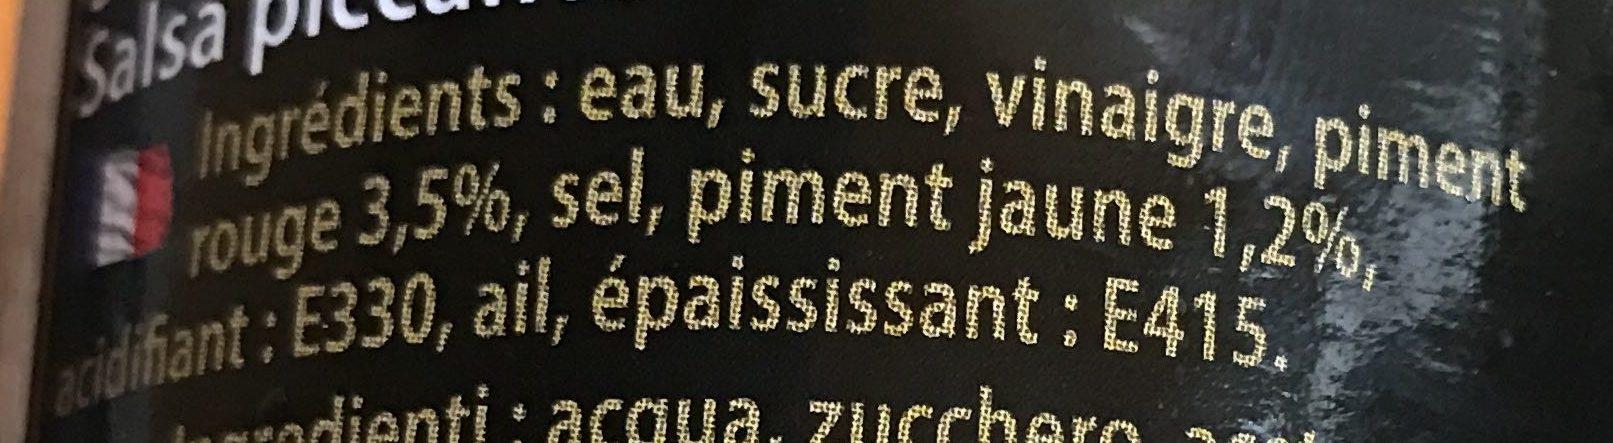 Sauce Pimentee Pour Salade - Ingredients - fr